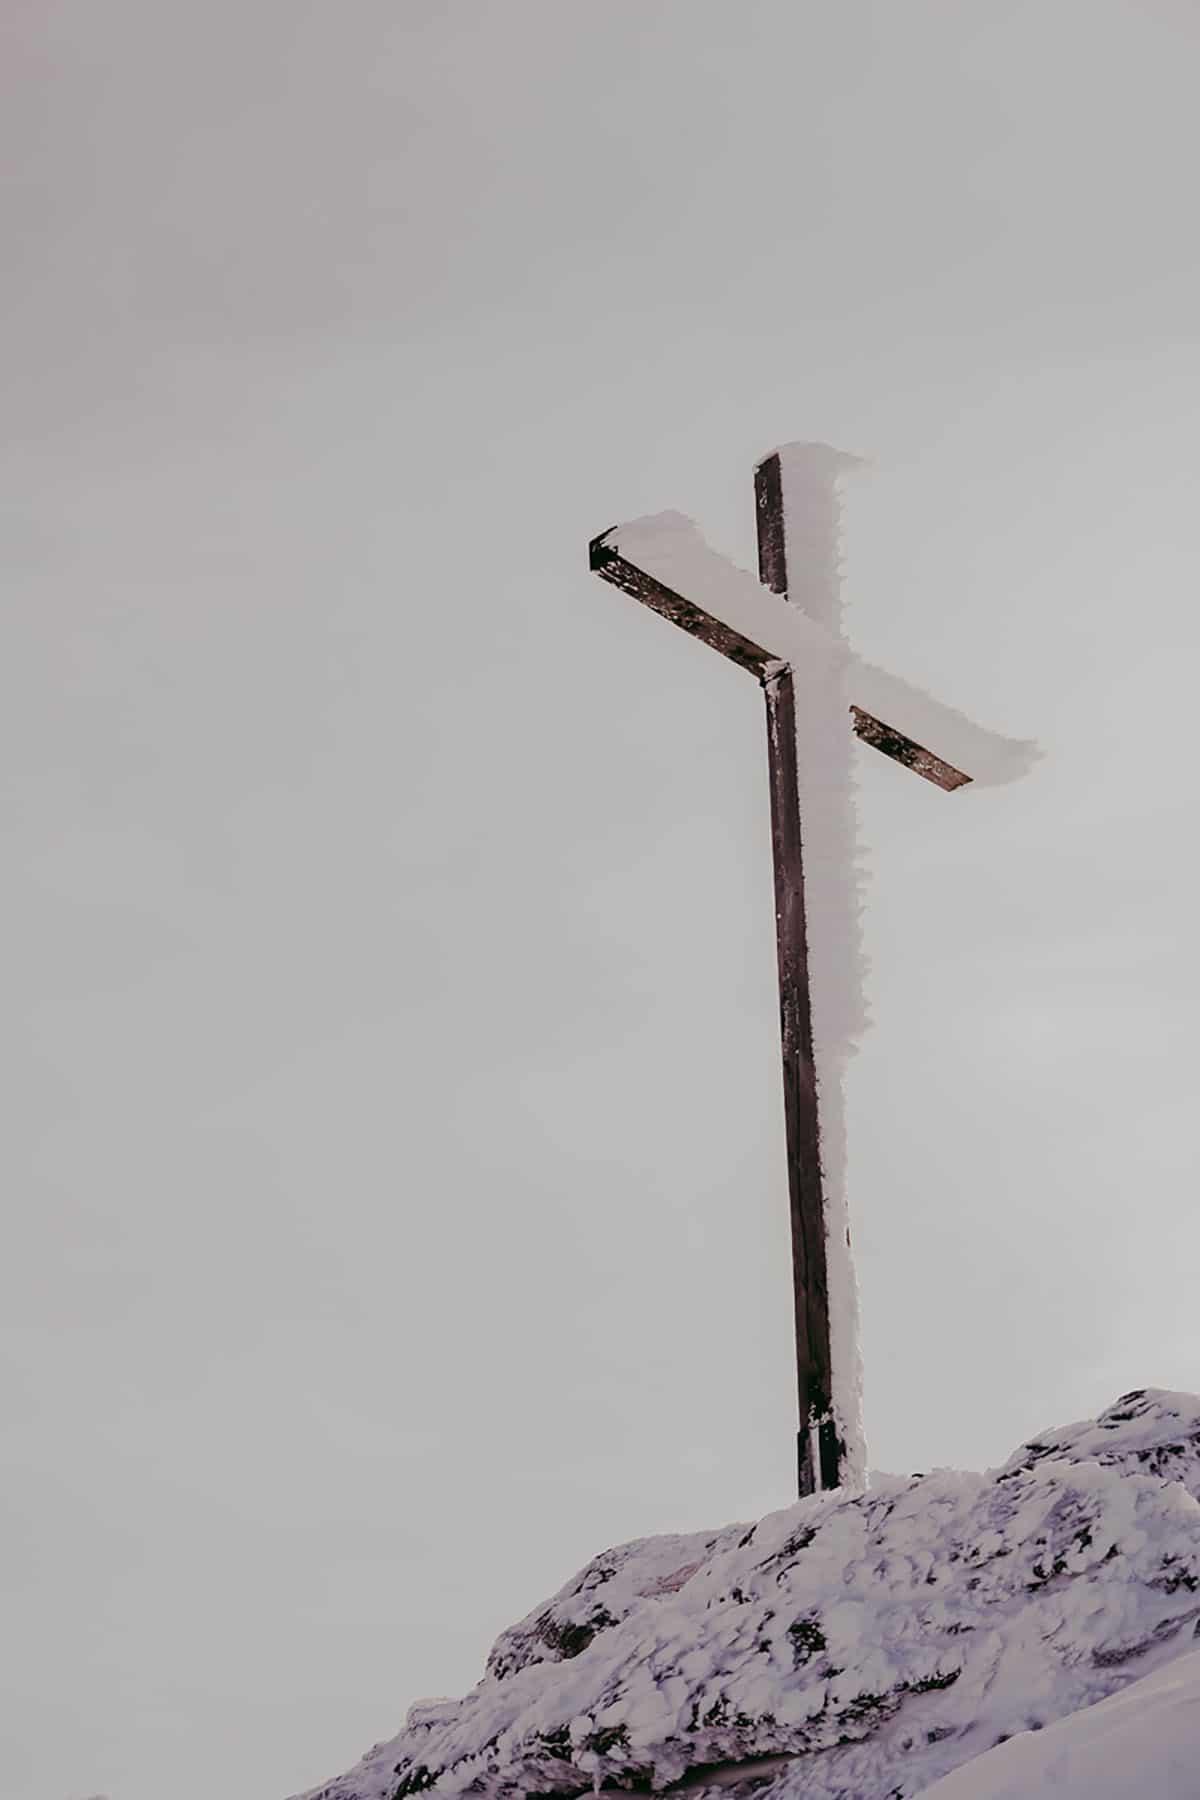 arber-winter-schnee-gipfelkreuz